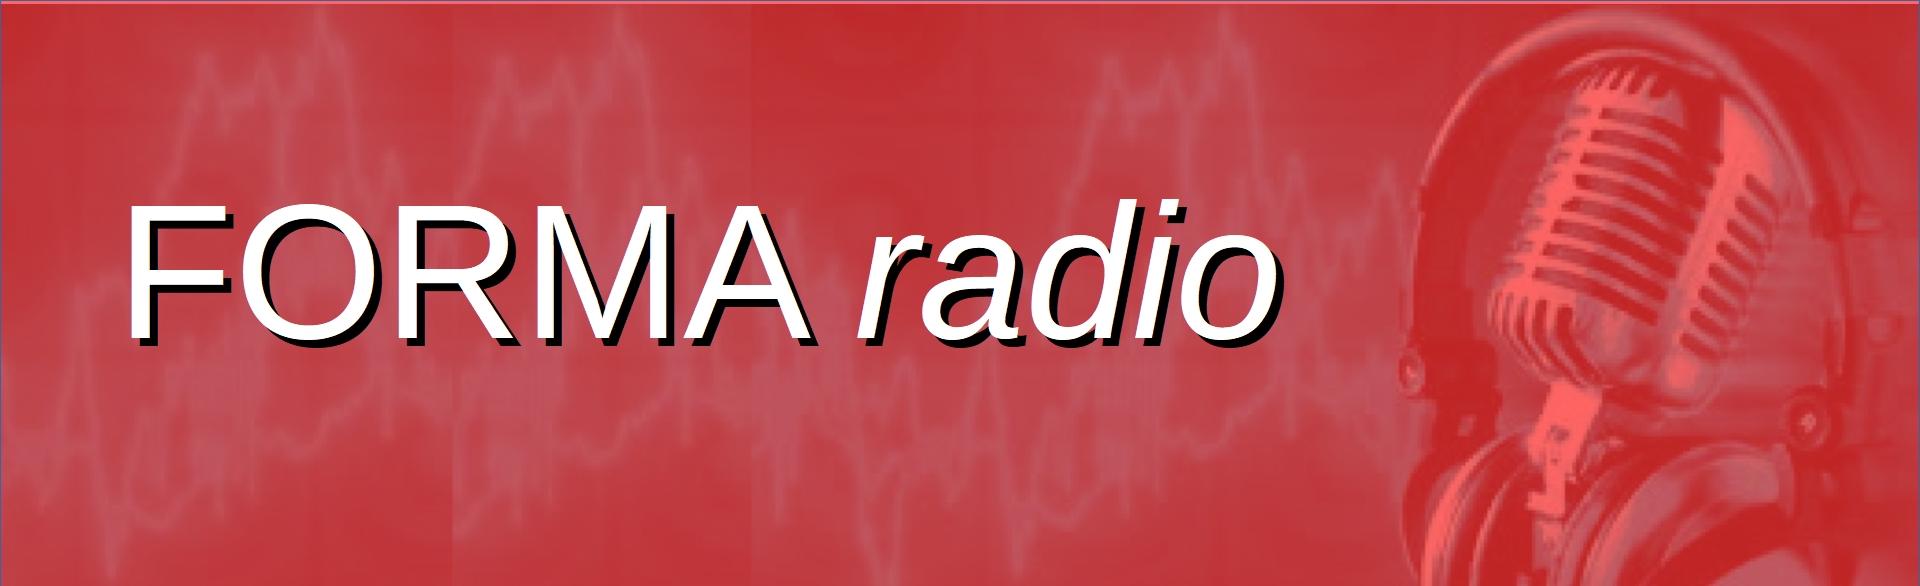 forma radio